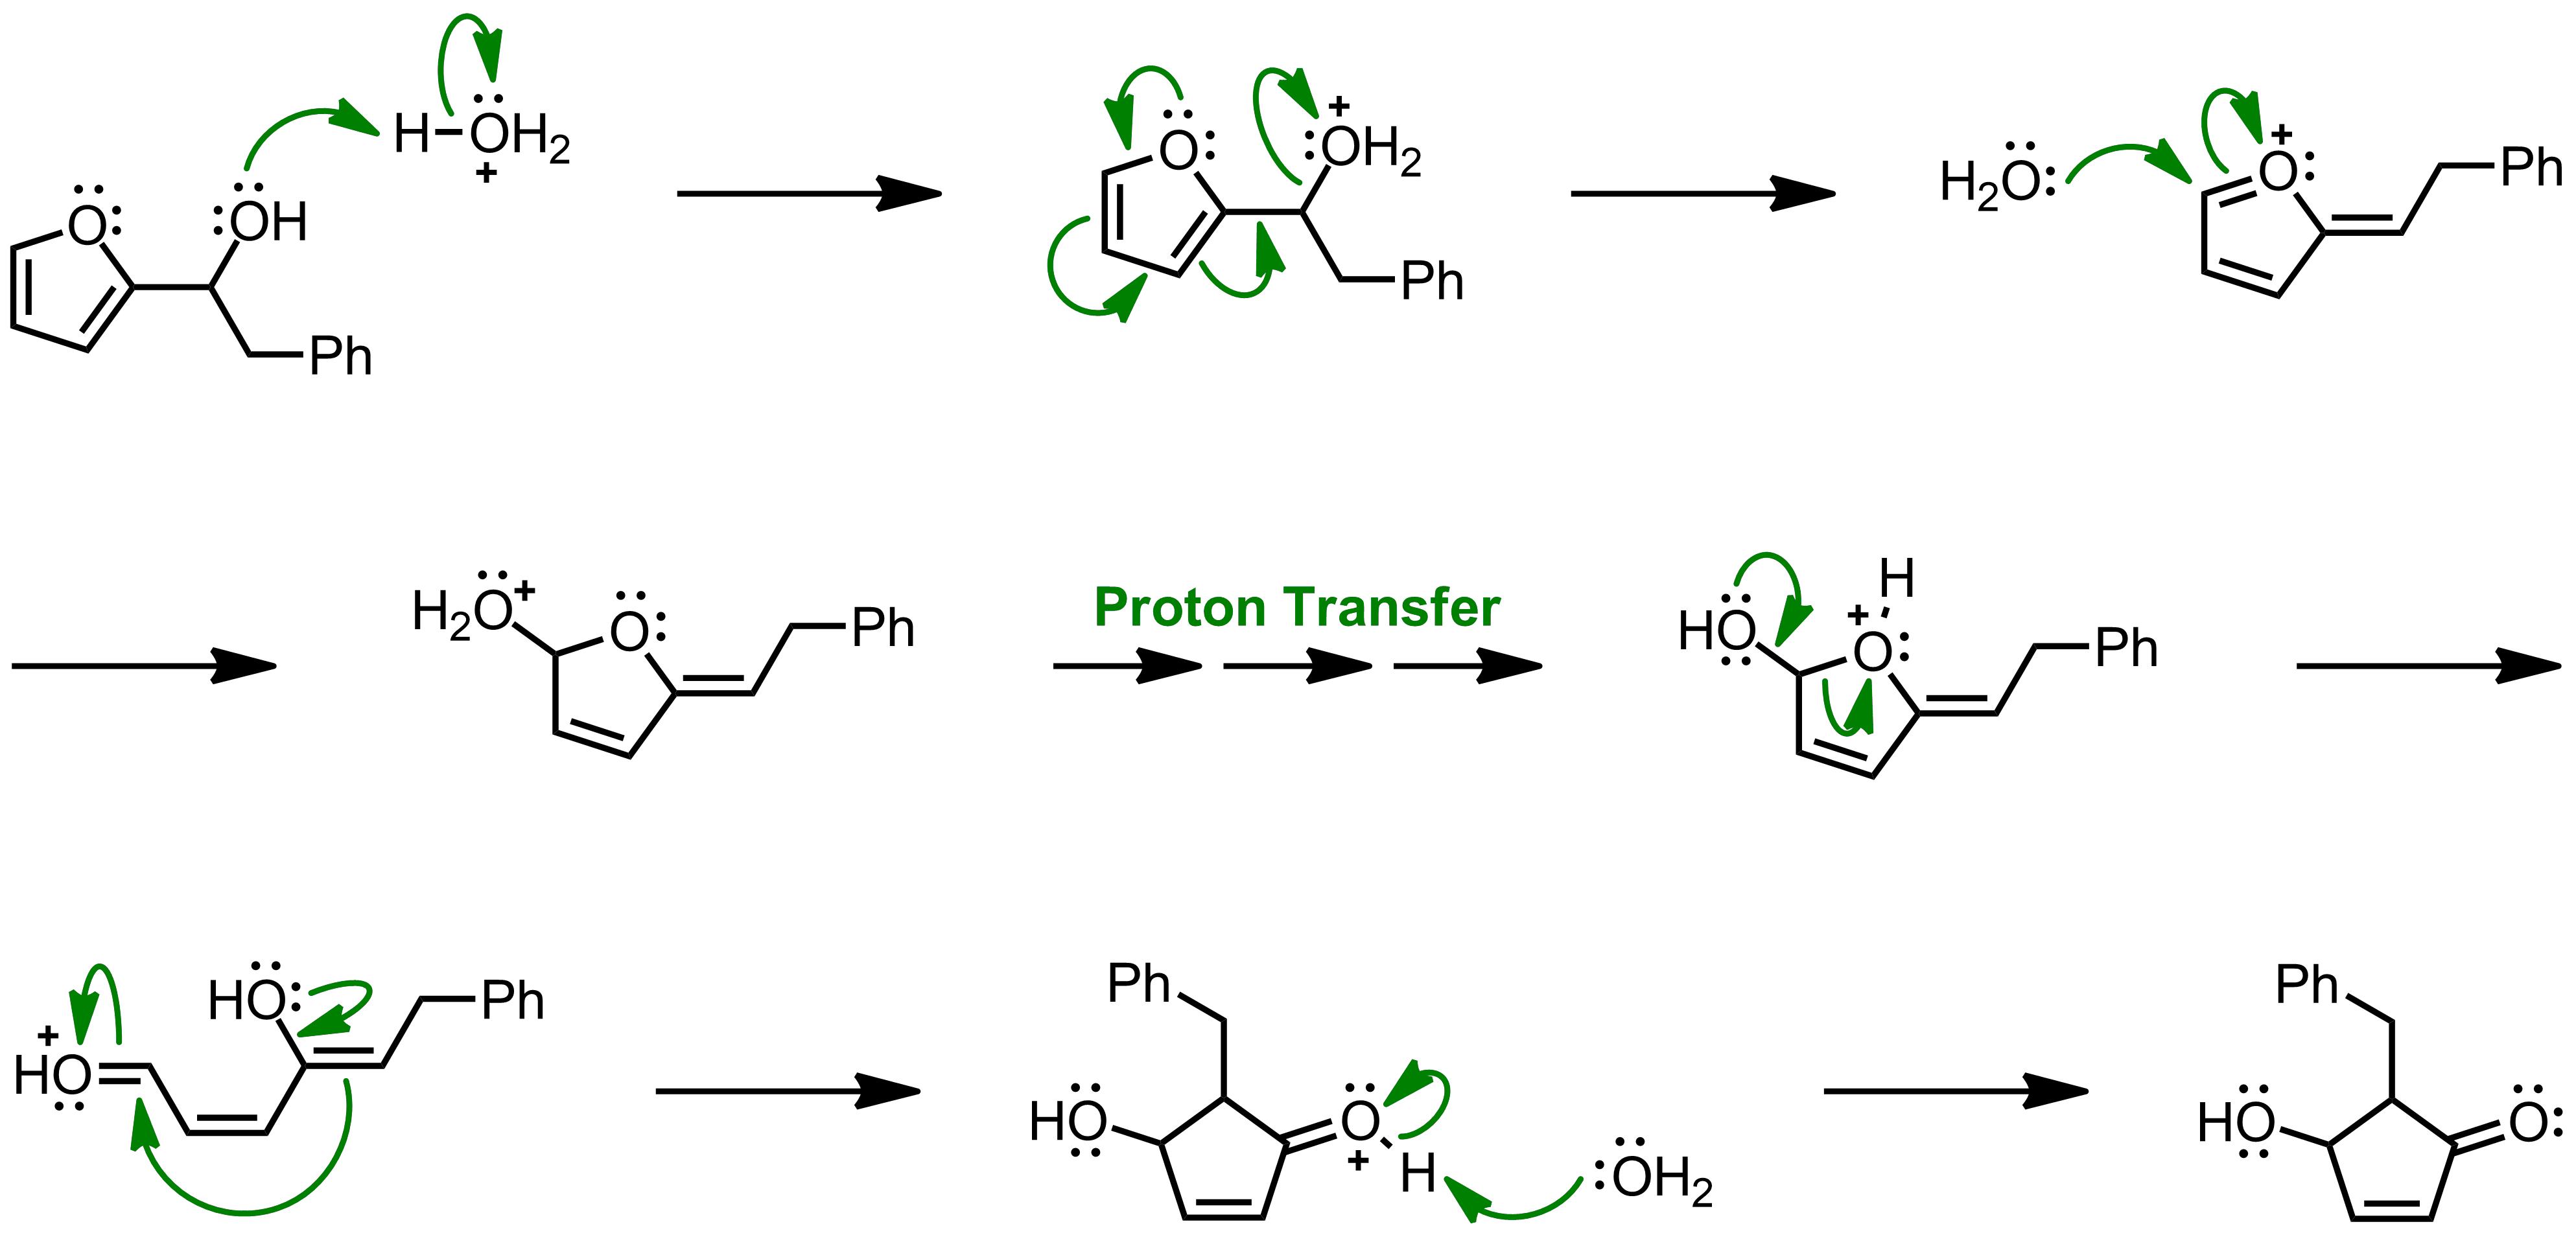 Mechanism of the Piancatelli Rearrangement